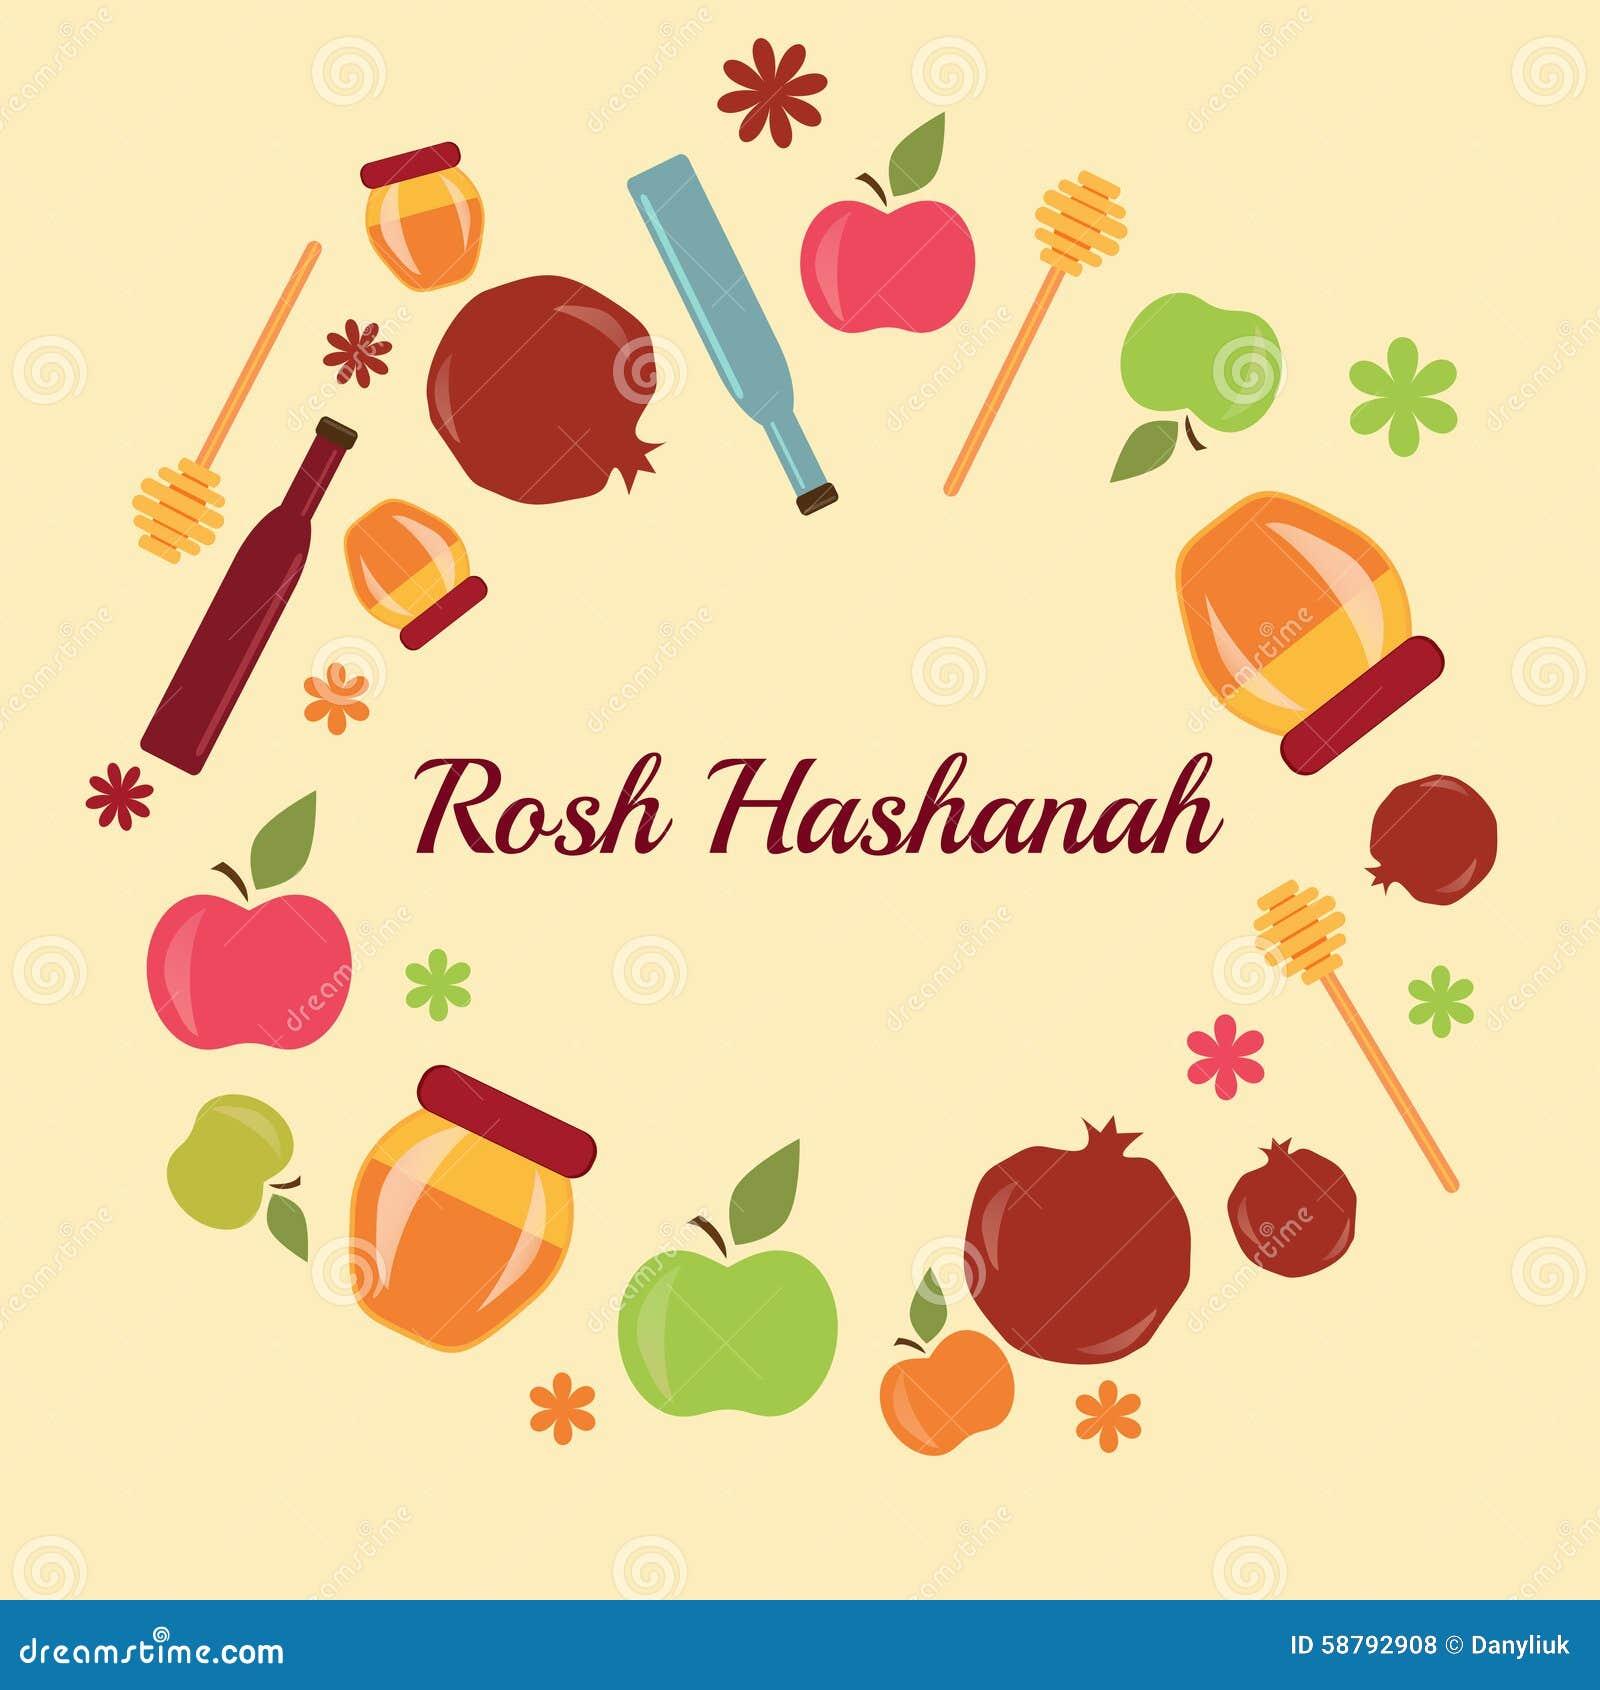 Rosh hashanah date in Brisbane